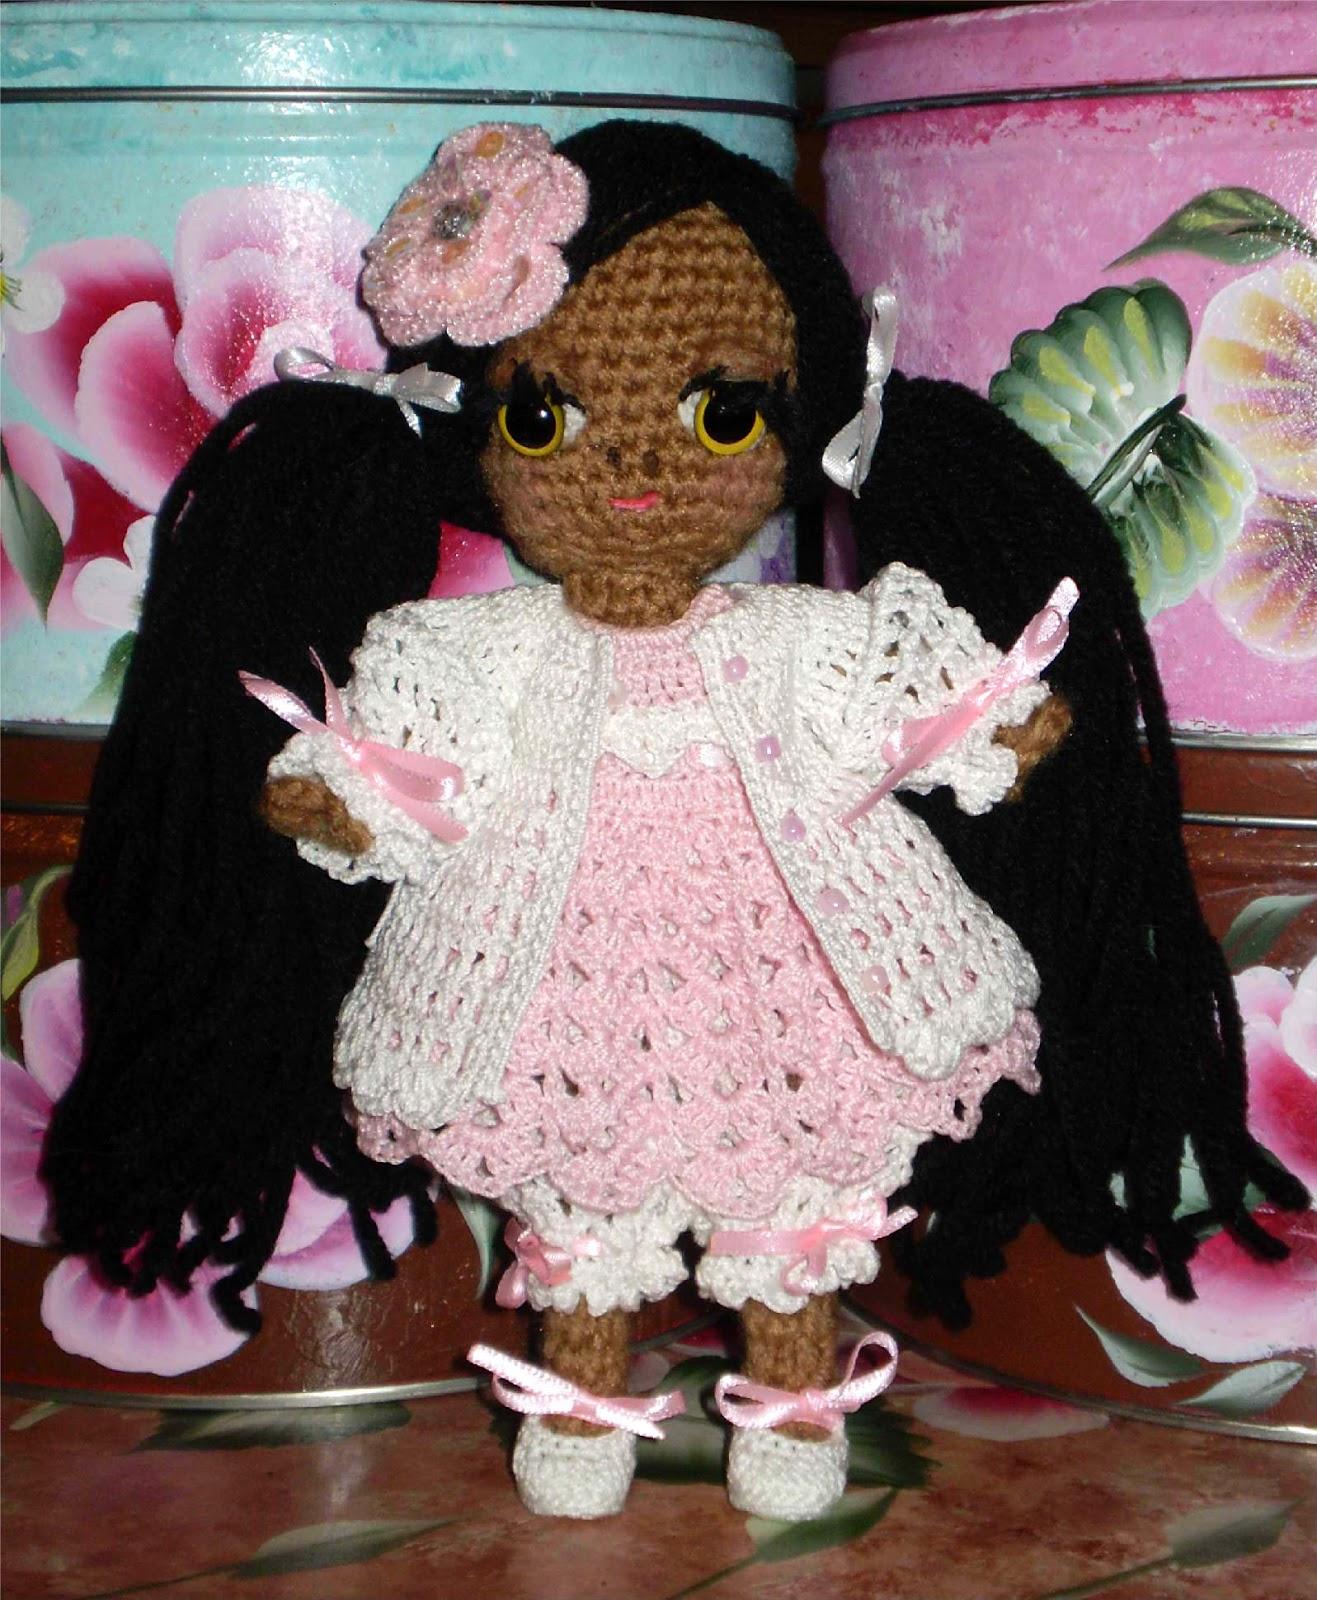 Amigurumi doll crochet pattern,crochet sleepy doll with pillow ... | 1600x1317